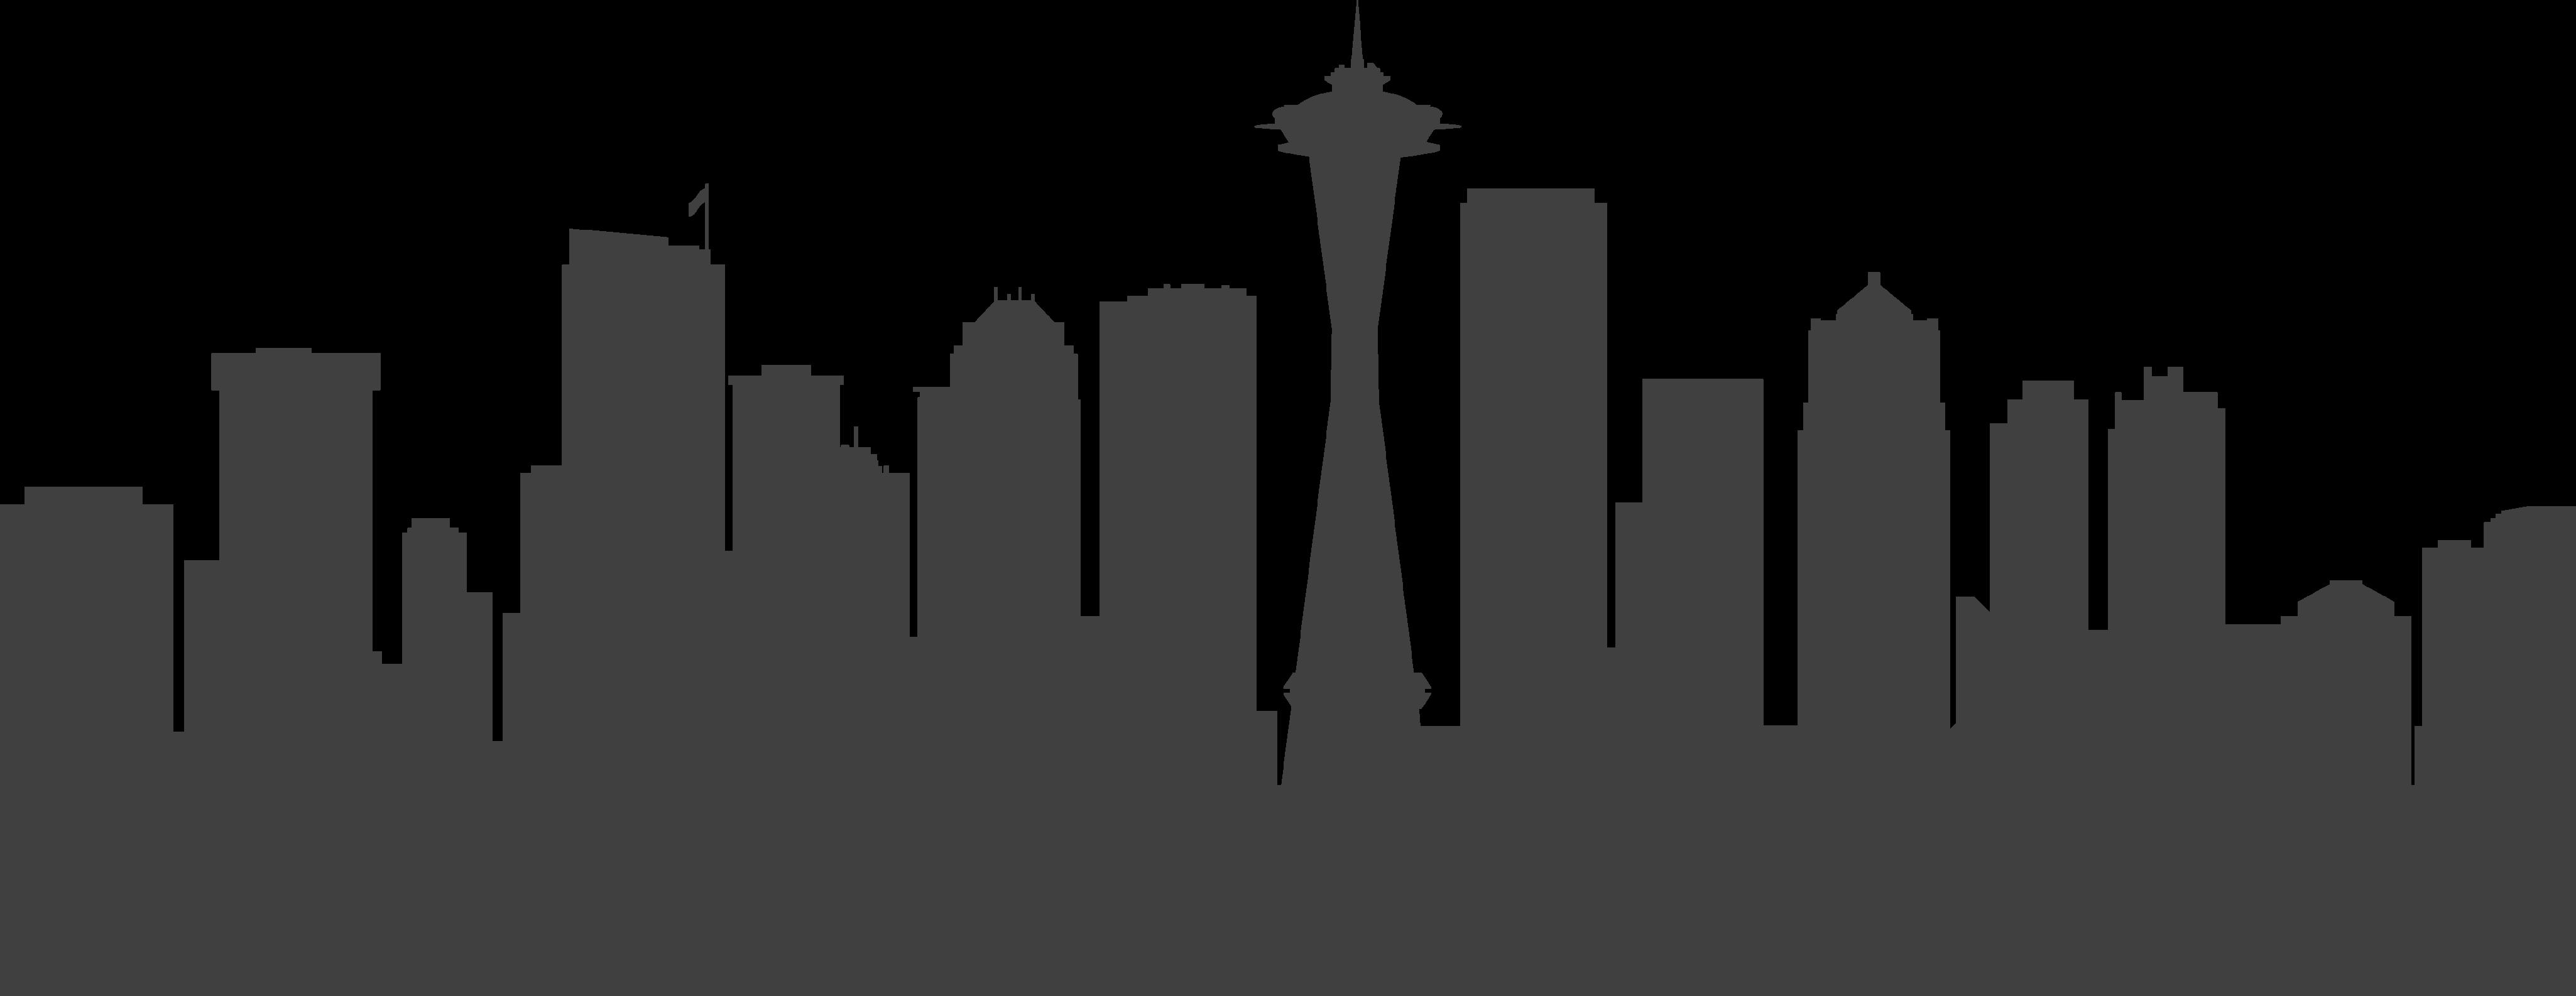 Seattle Vector graphics Skyline Stock illustration.